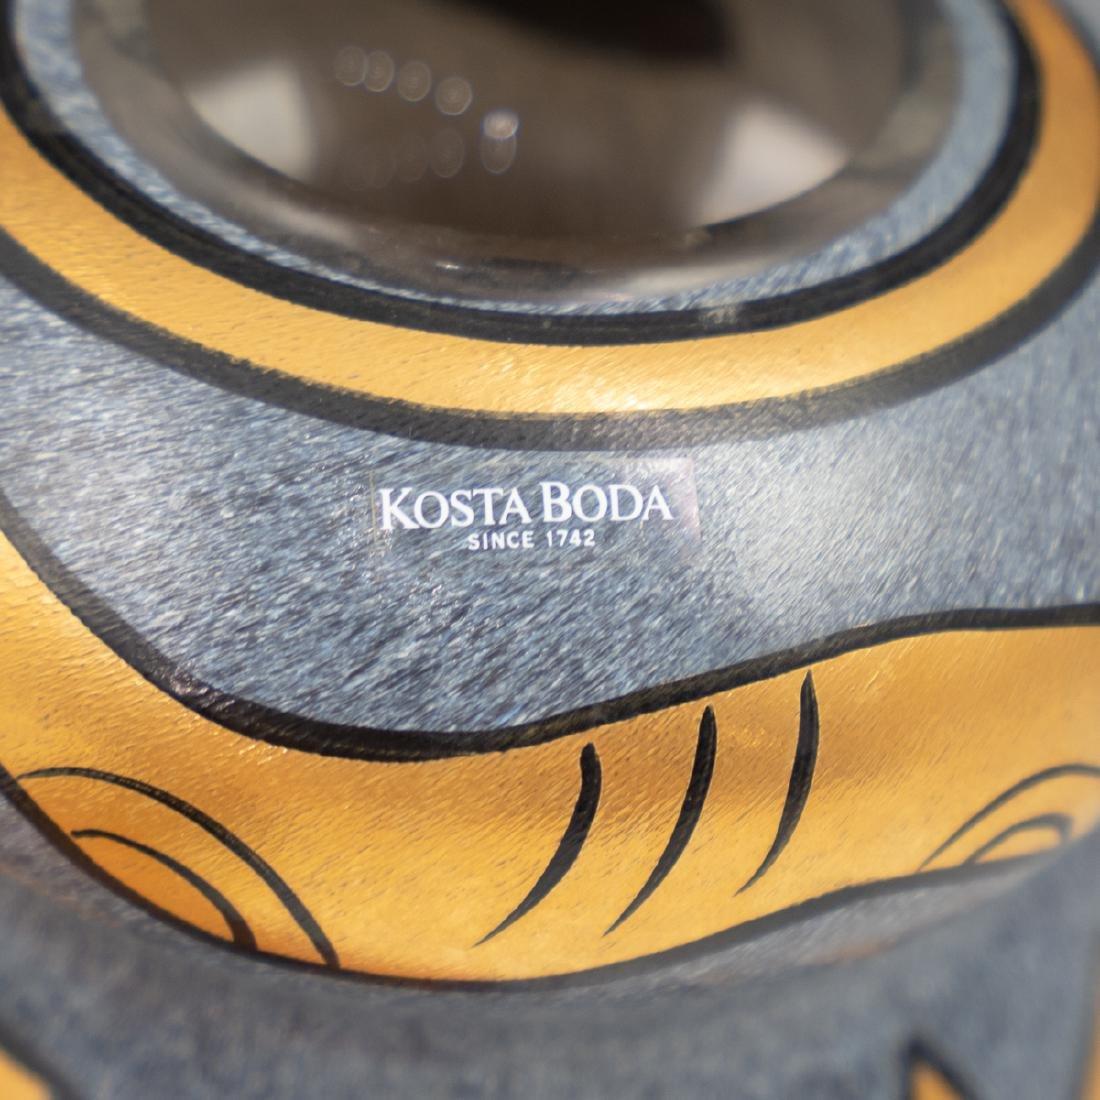 Kosta Boda Double Guard Crystal Vase - 2